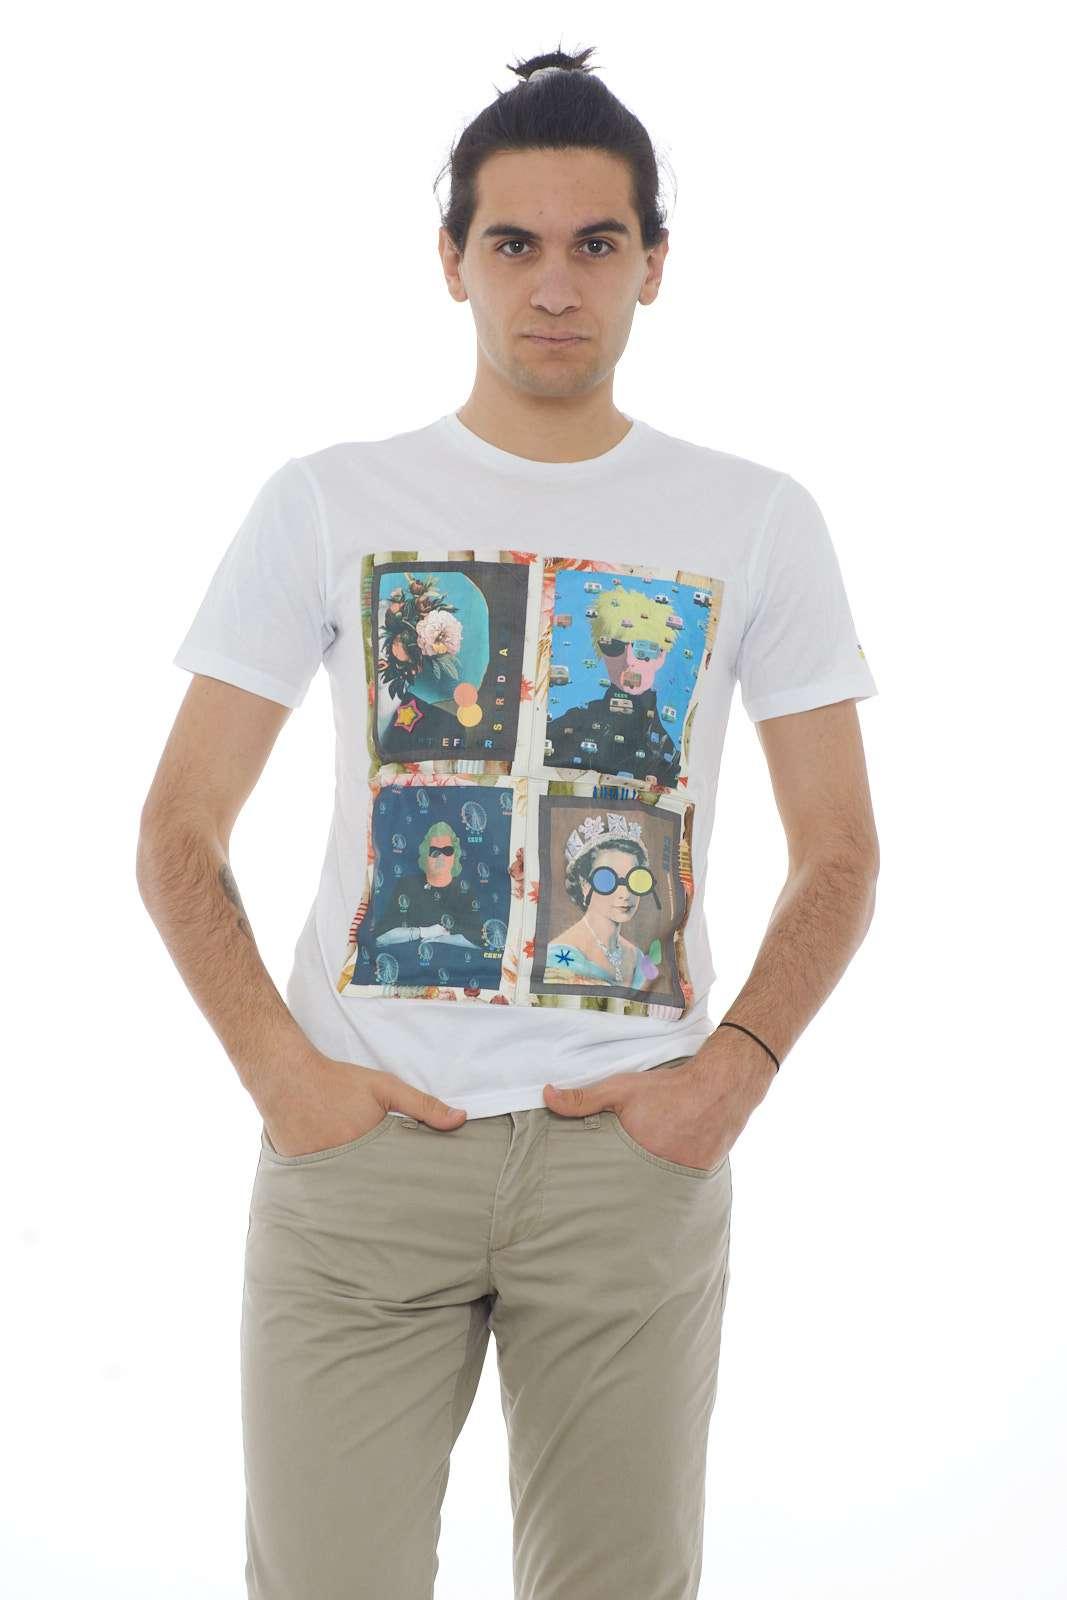 https://www.parmax.com/media/catalog/product/a/i/PE-outlet_parmax-t-shirt-uomo-Daniele-Alessandrini-M6870E6433900-A.jpg